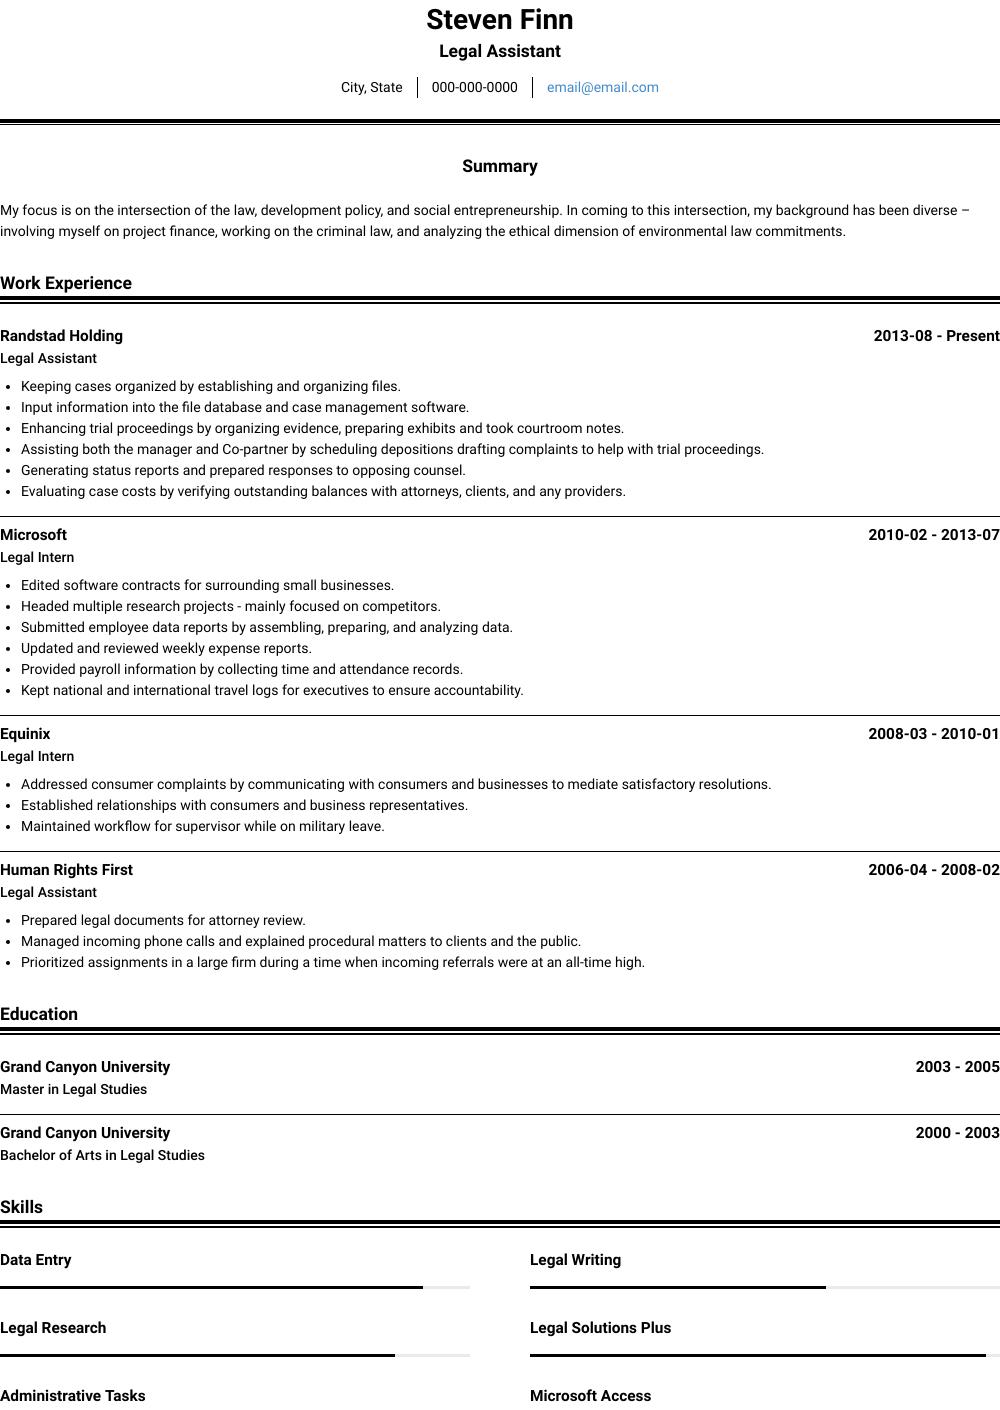 Legal Intern - Resume Samples & Templates | VisualCV